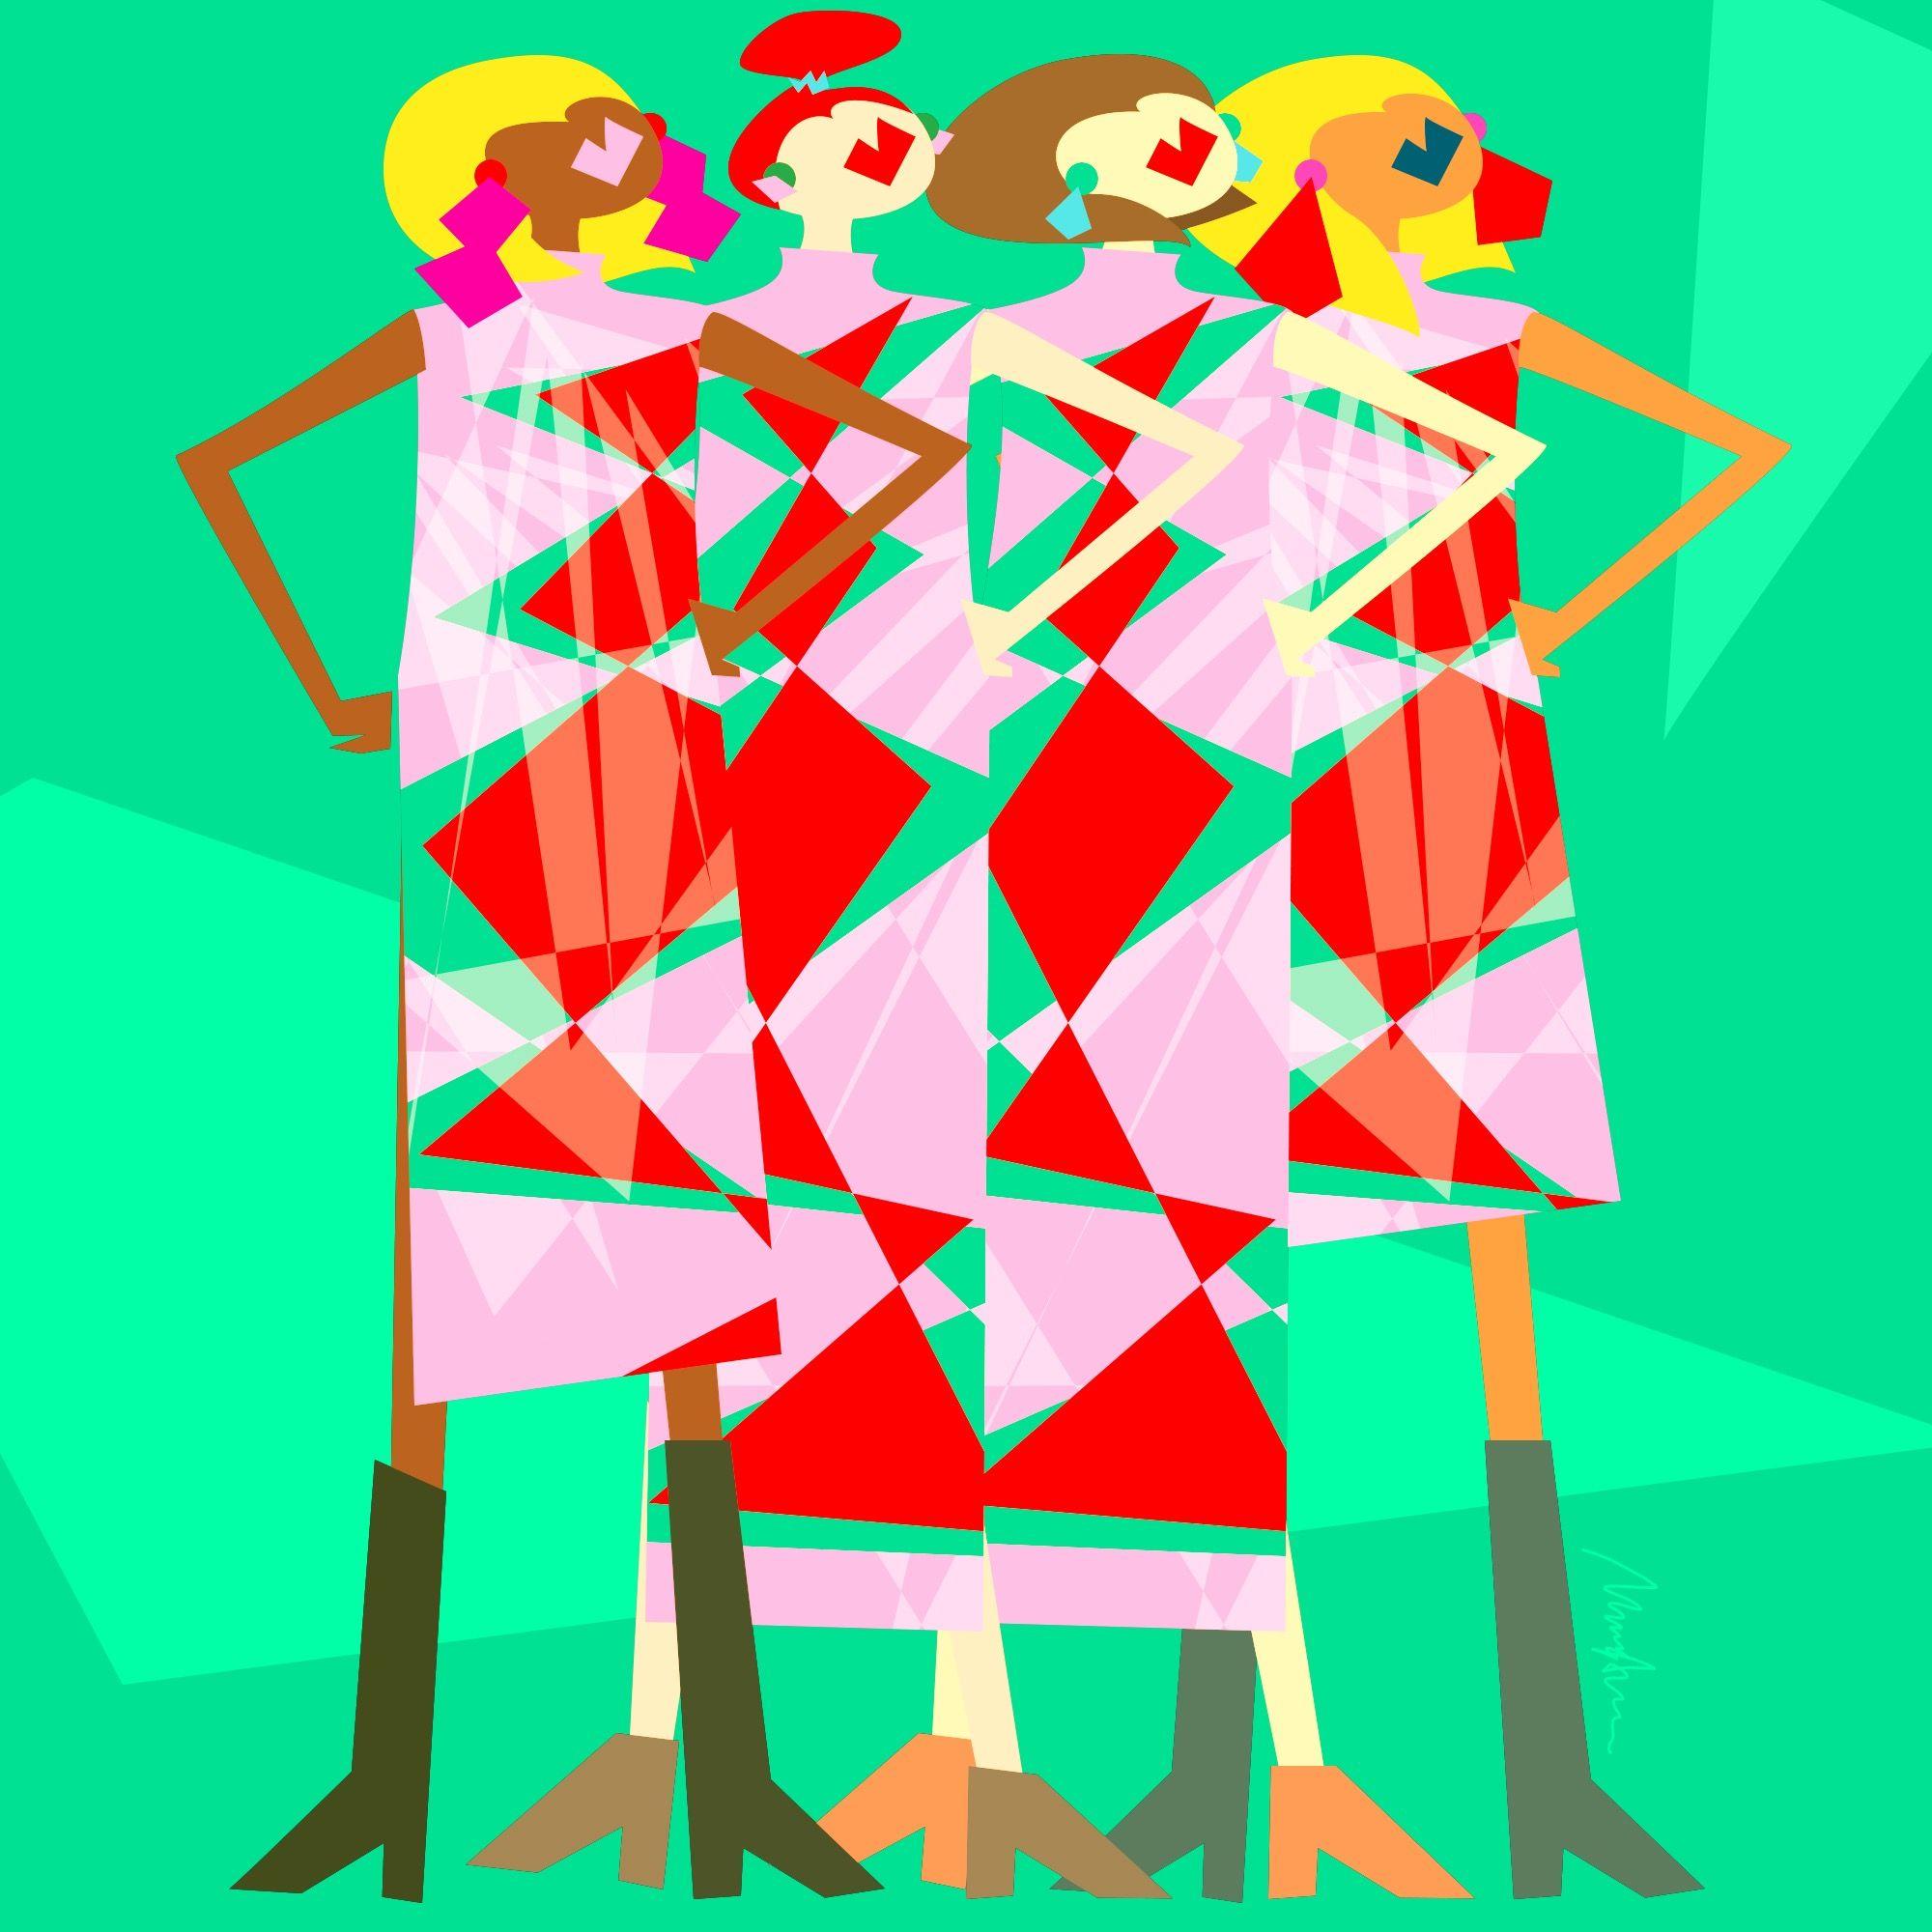 Design by Monica Ahanonu